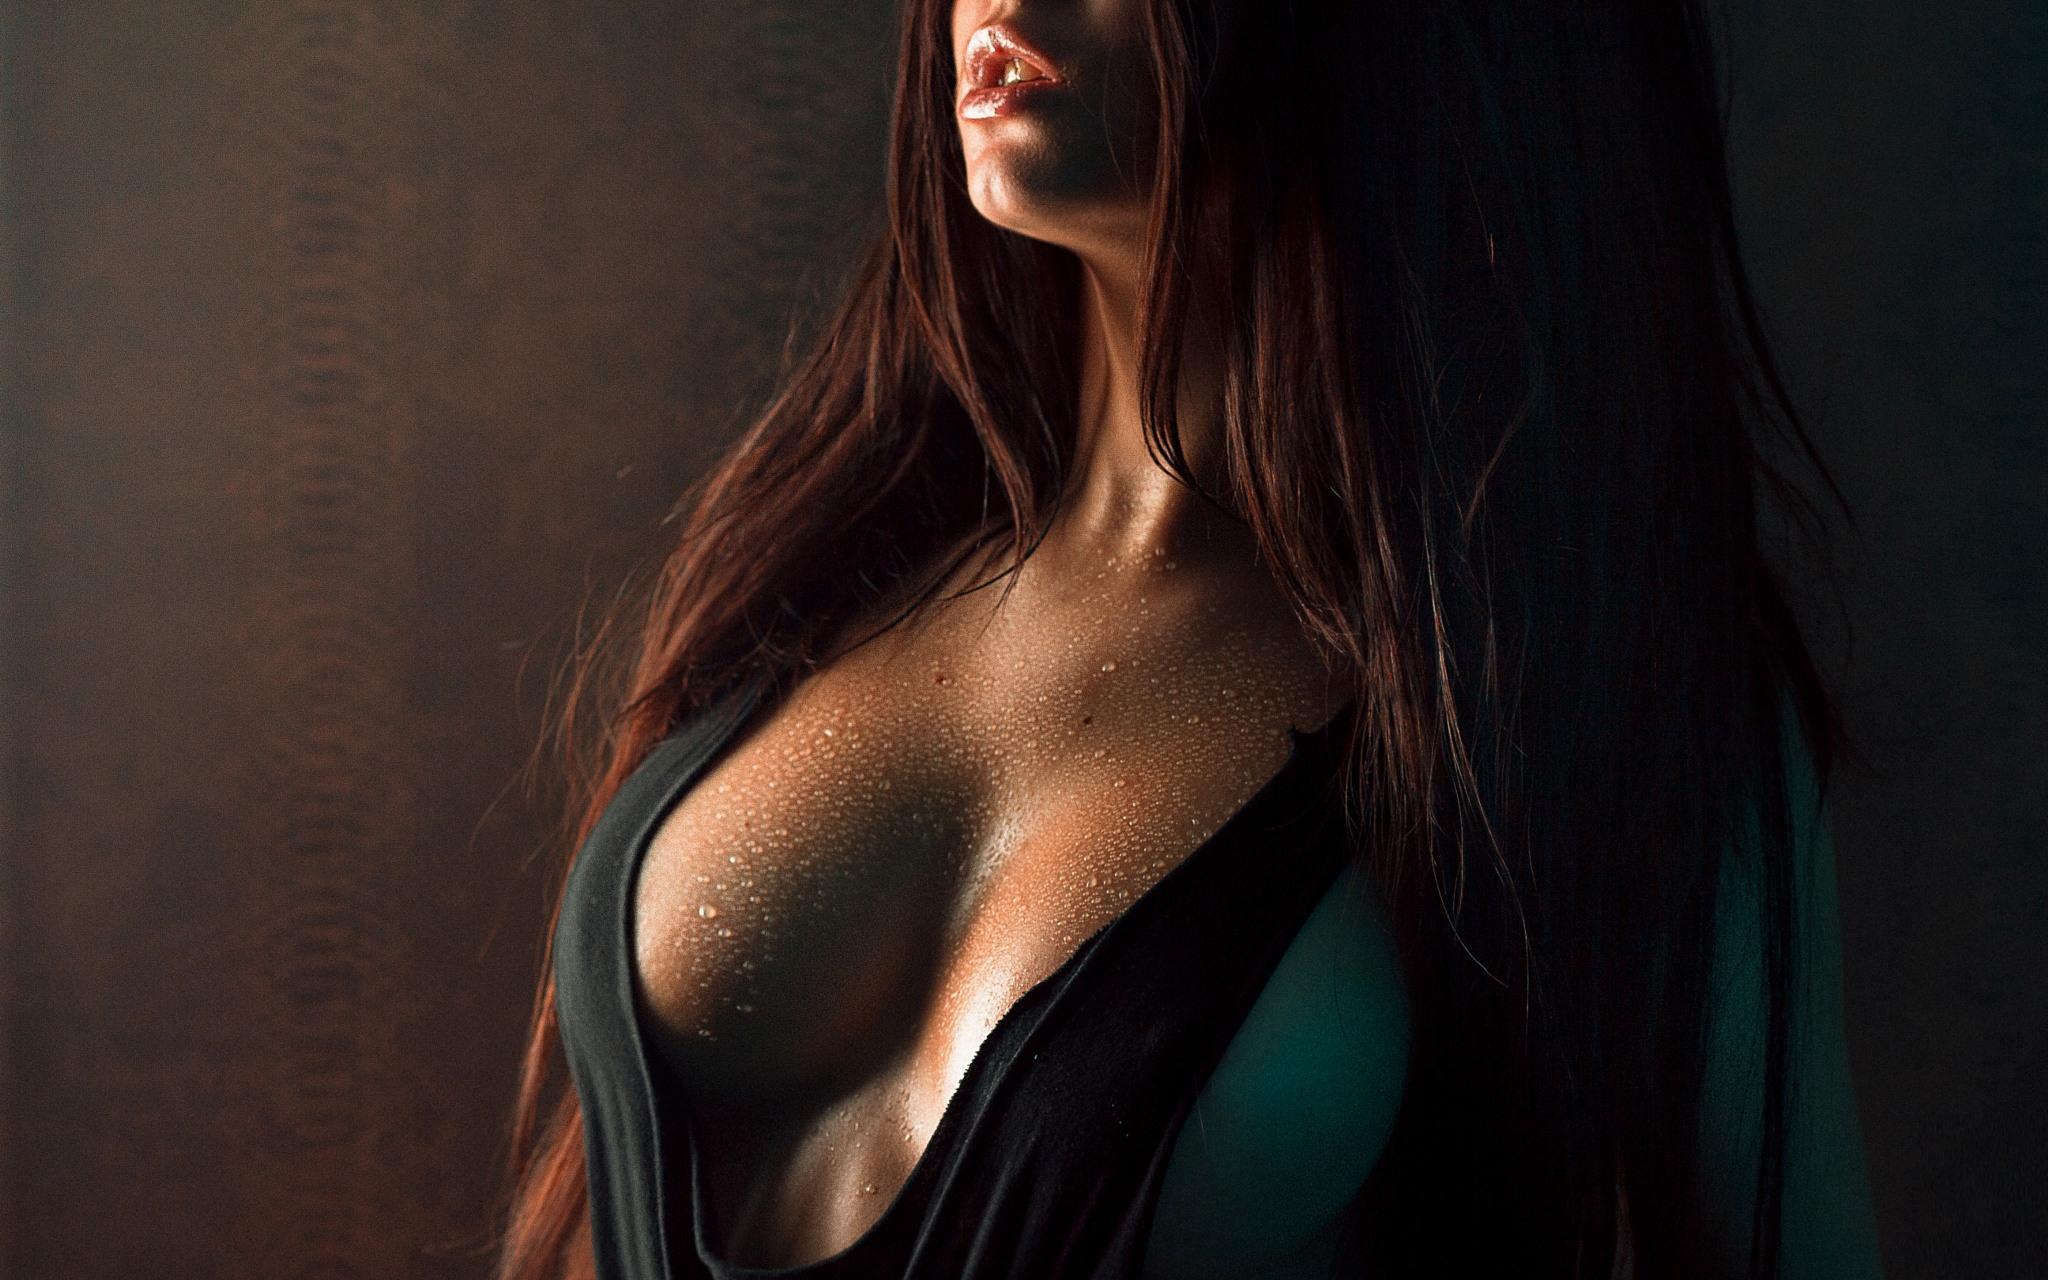 The average breast size of uk women has risen